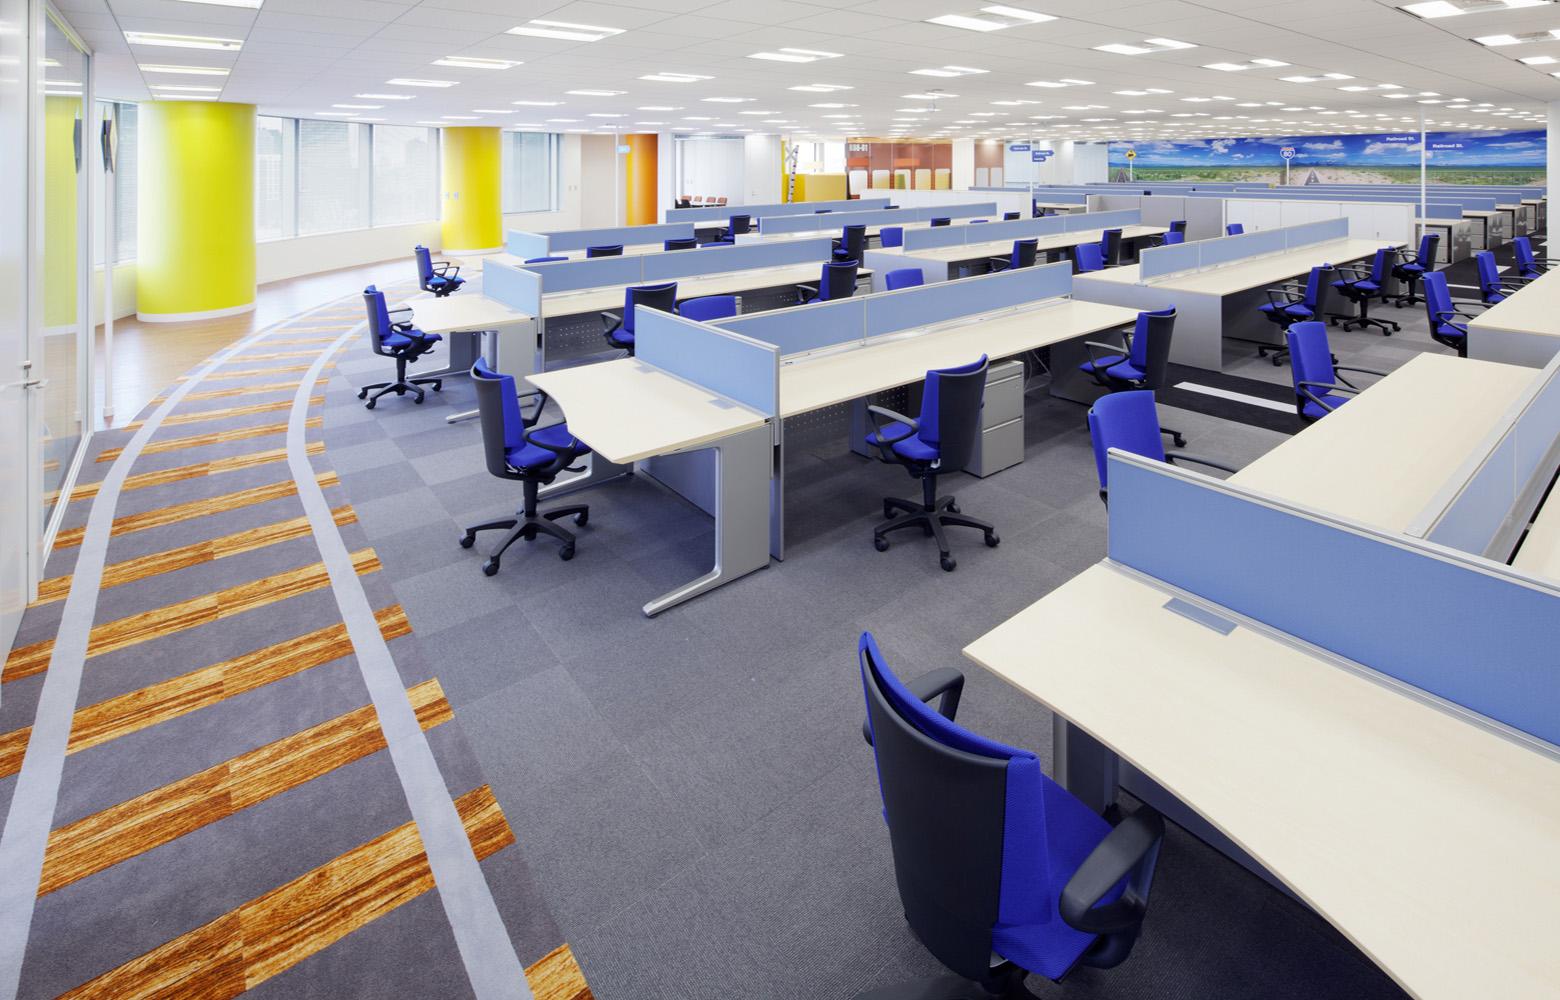 KLab株式会社 Work Space_2 デザイン・レイアウト事例